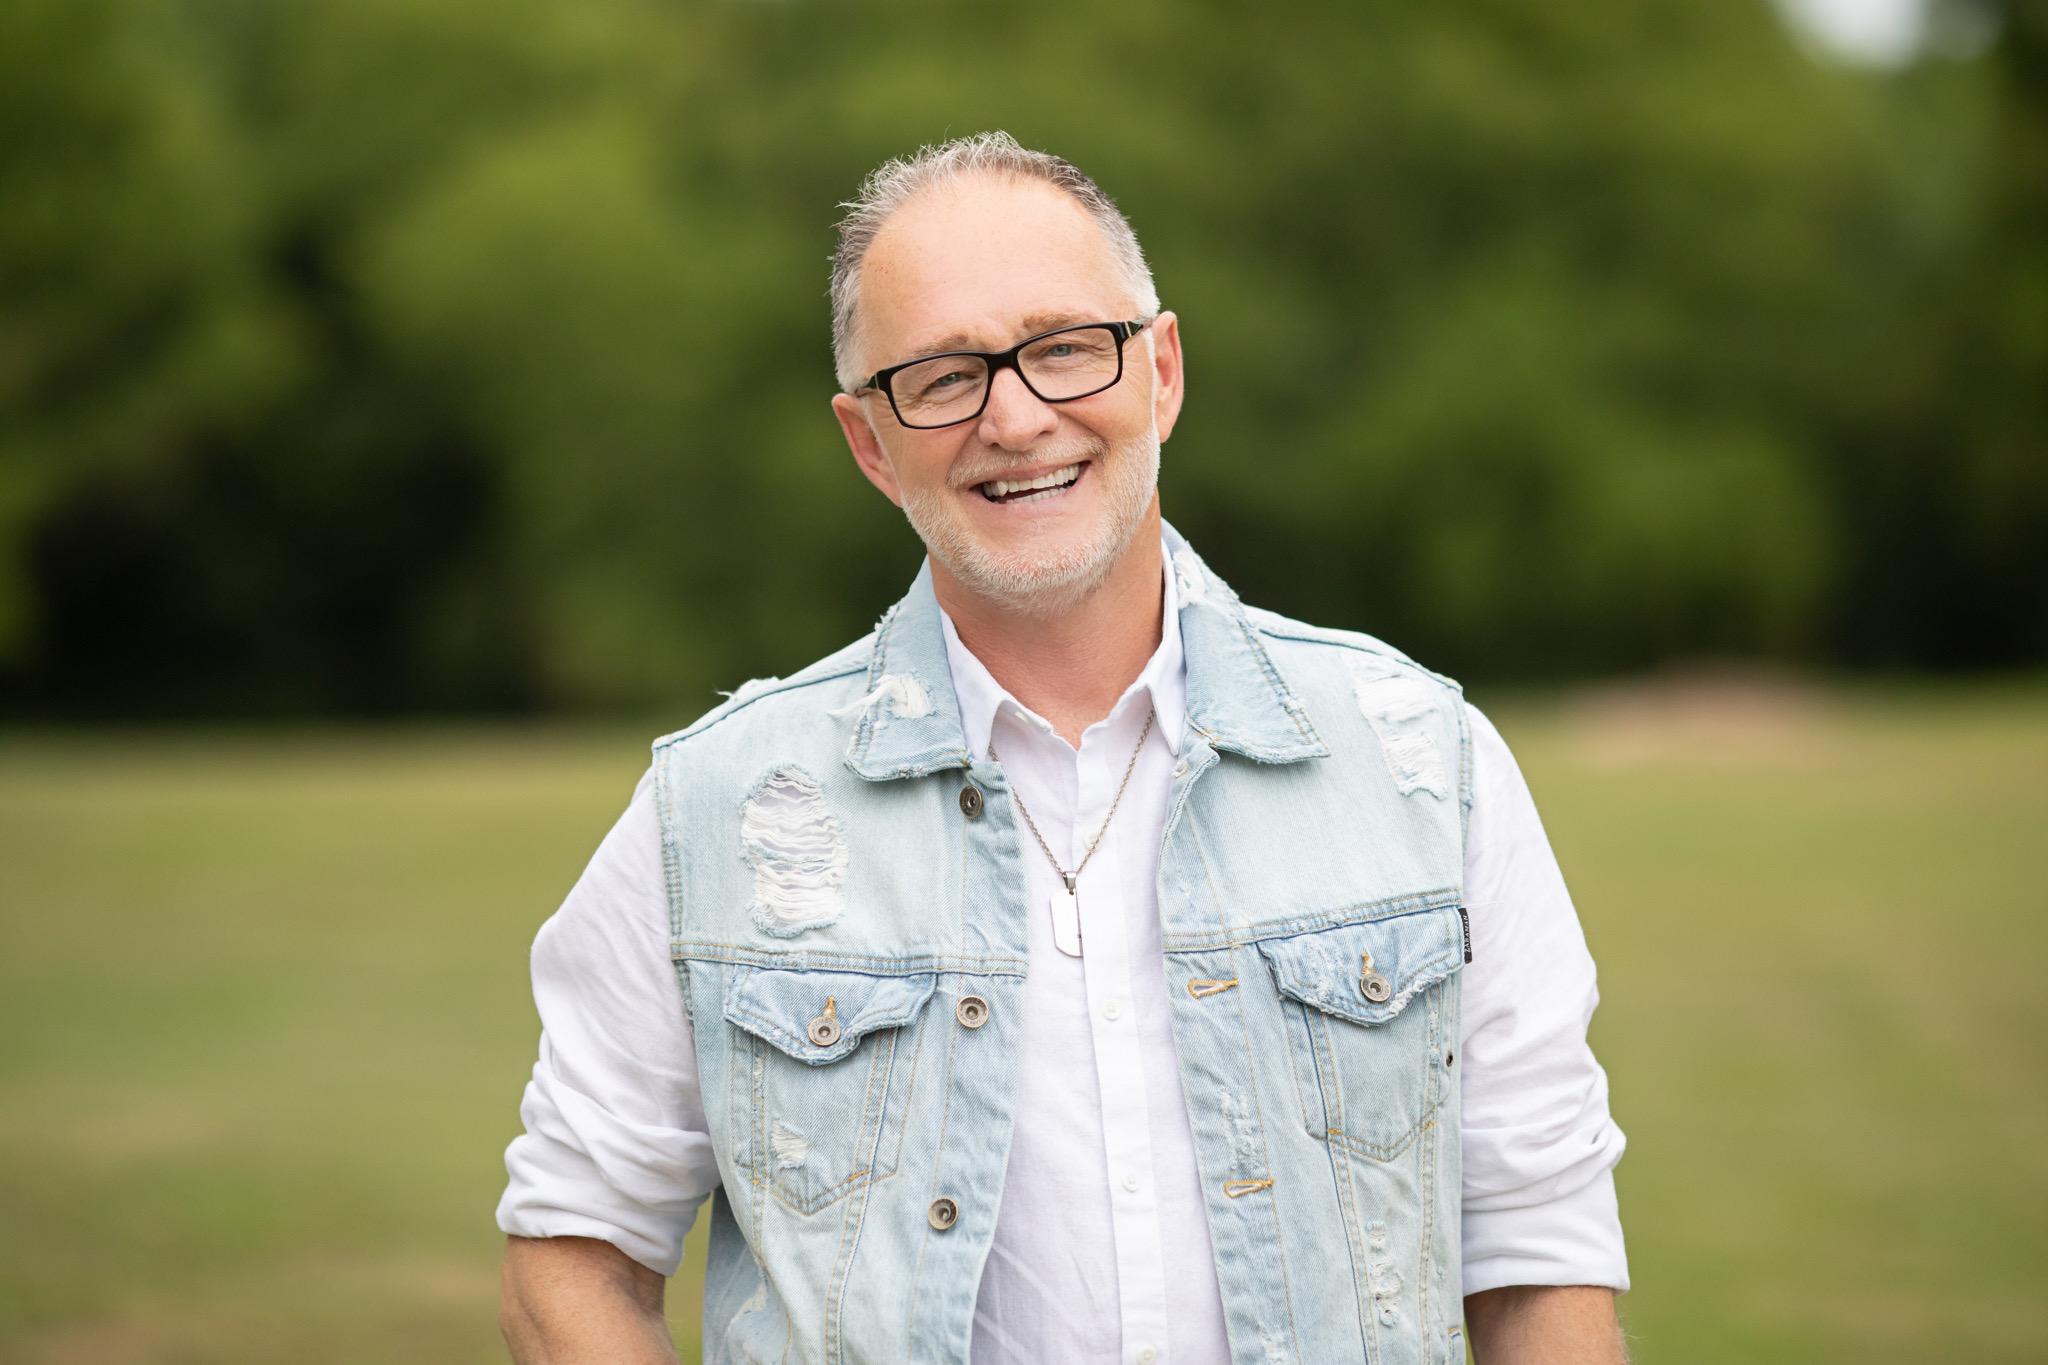 Pastor Thomas McDaniels